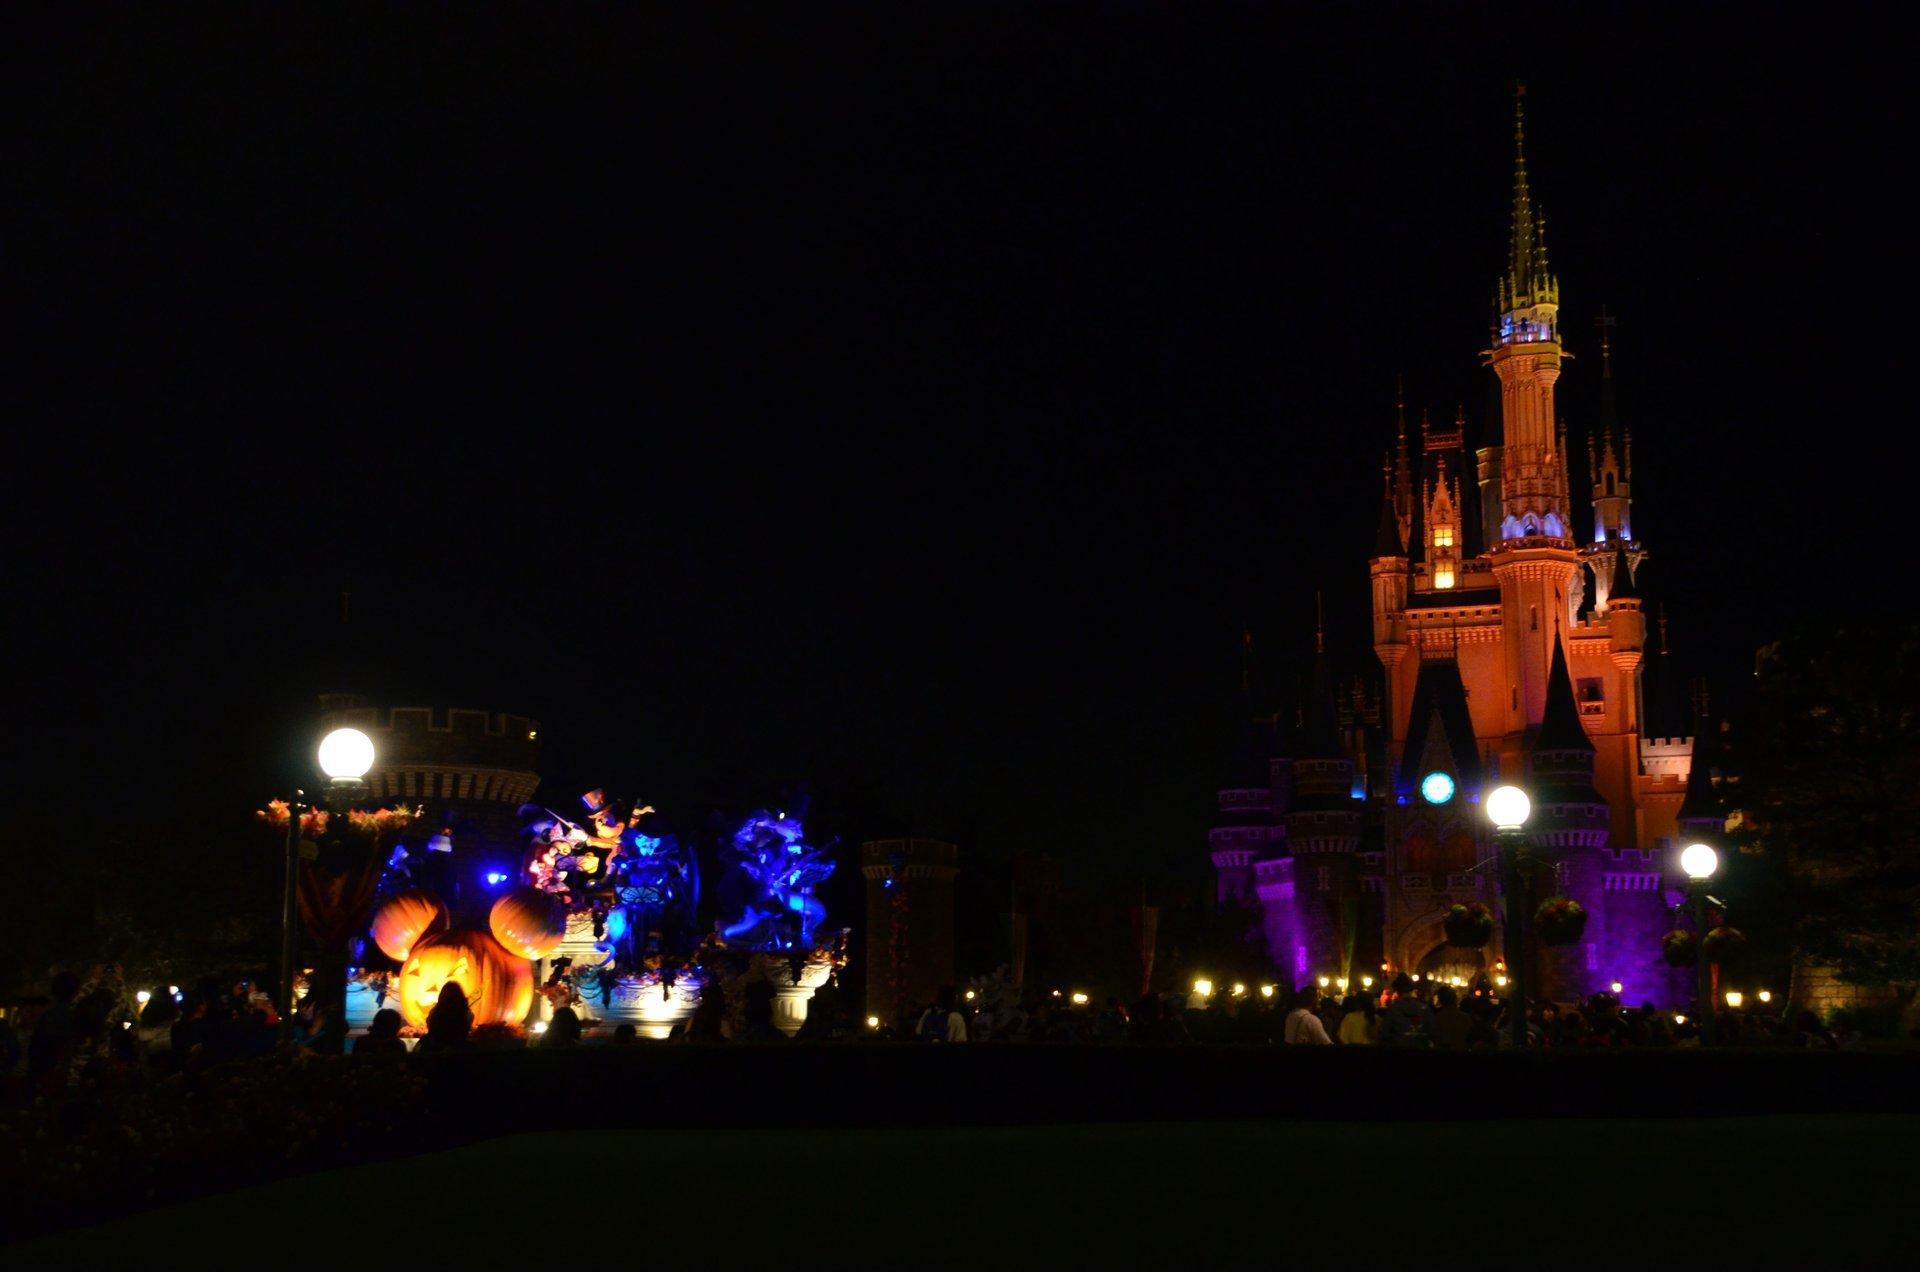 Halloween at Tokyo Disneyland 2020